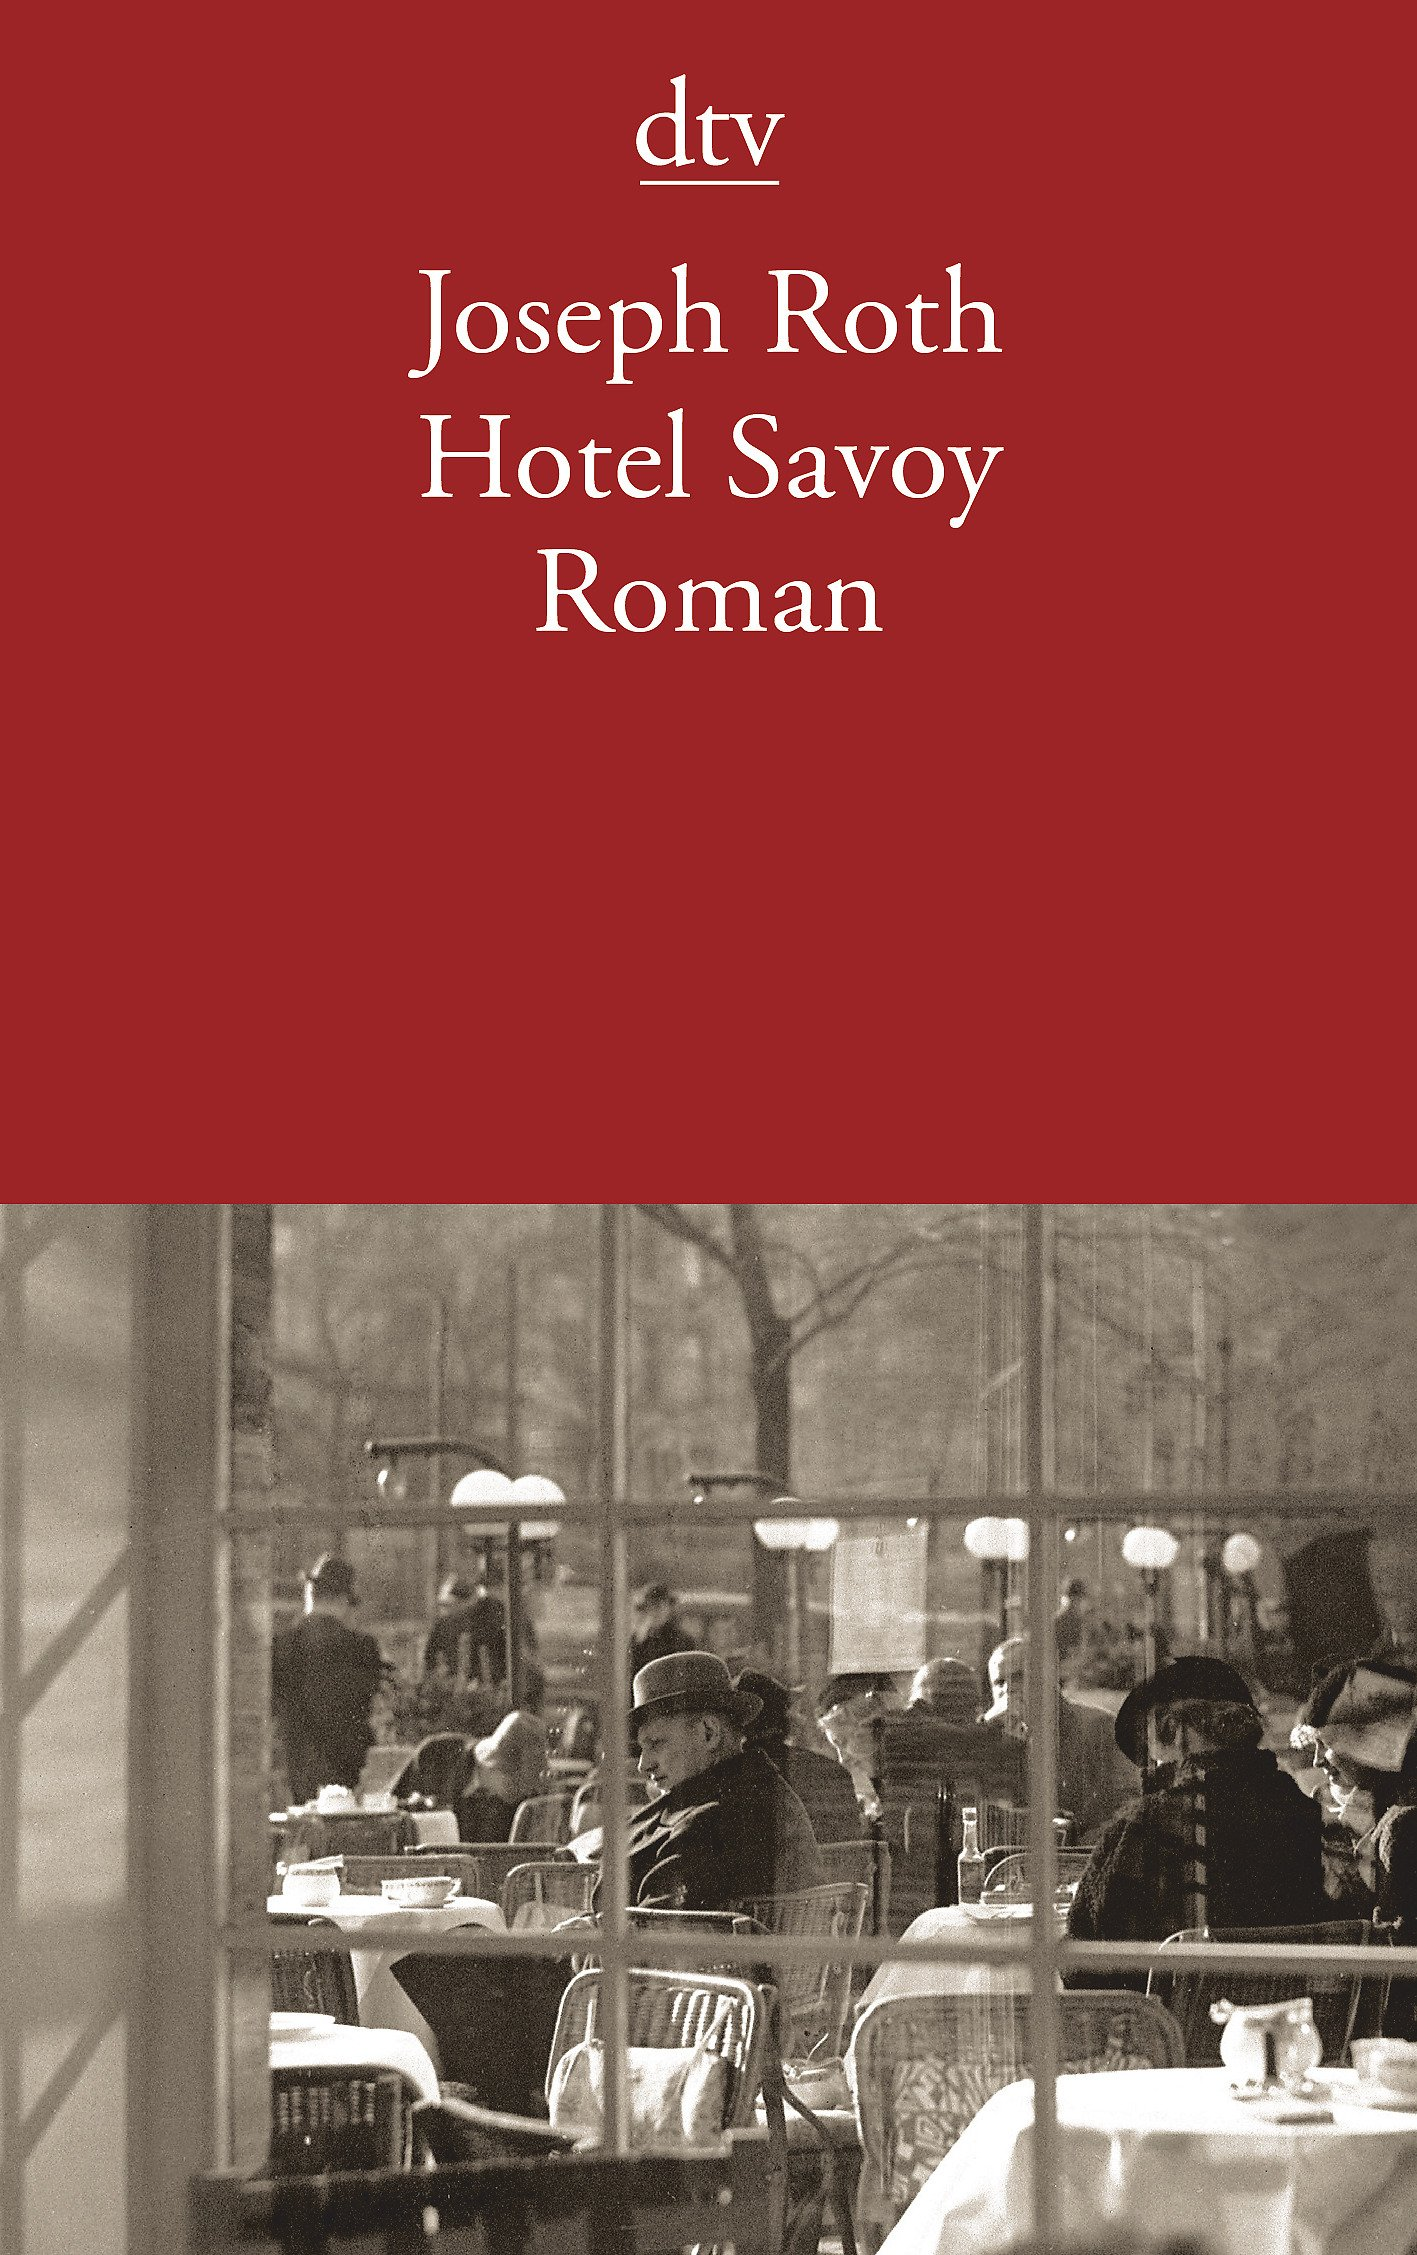 Hotel Savoy: Roman: Amazon.de: Joseph Roth: Bücher